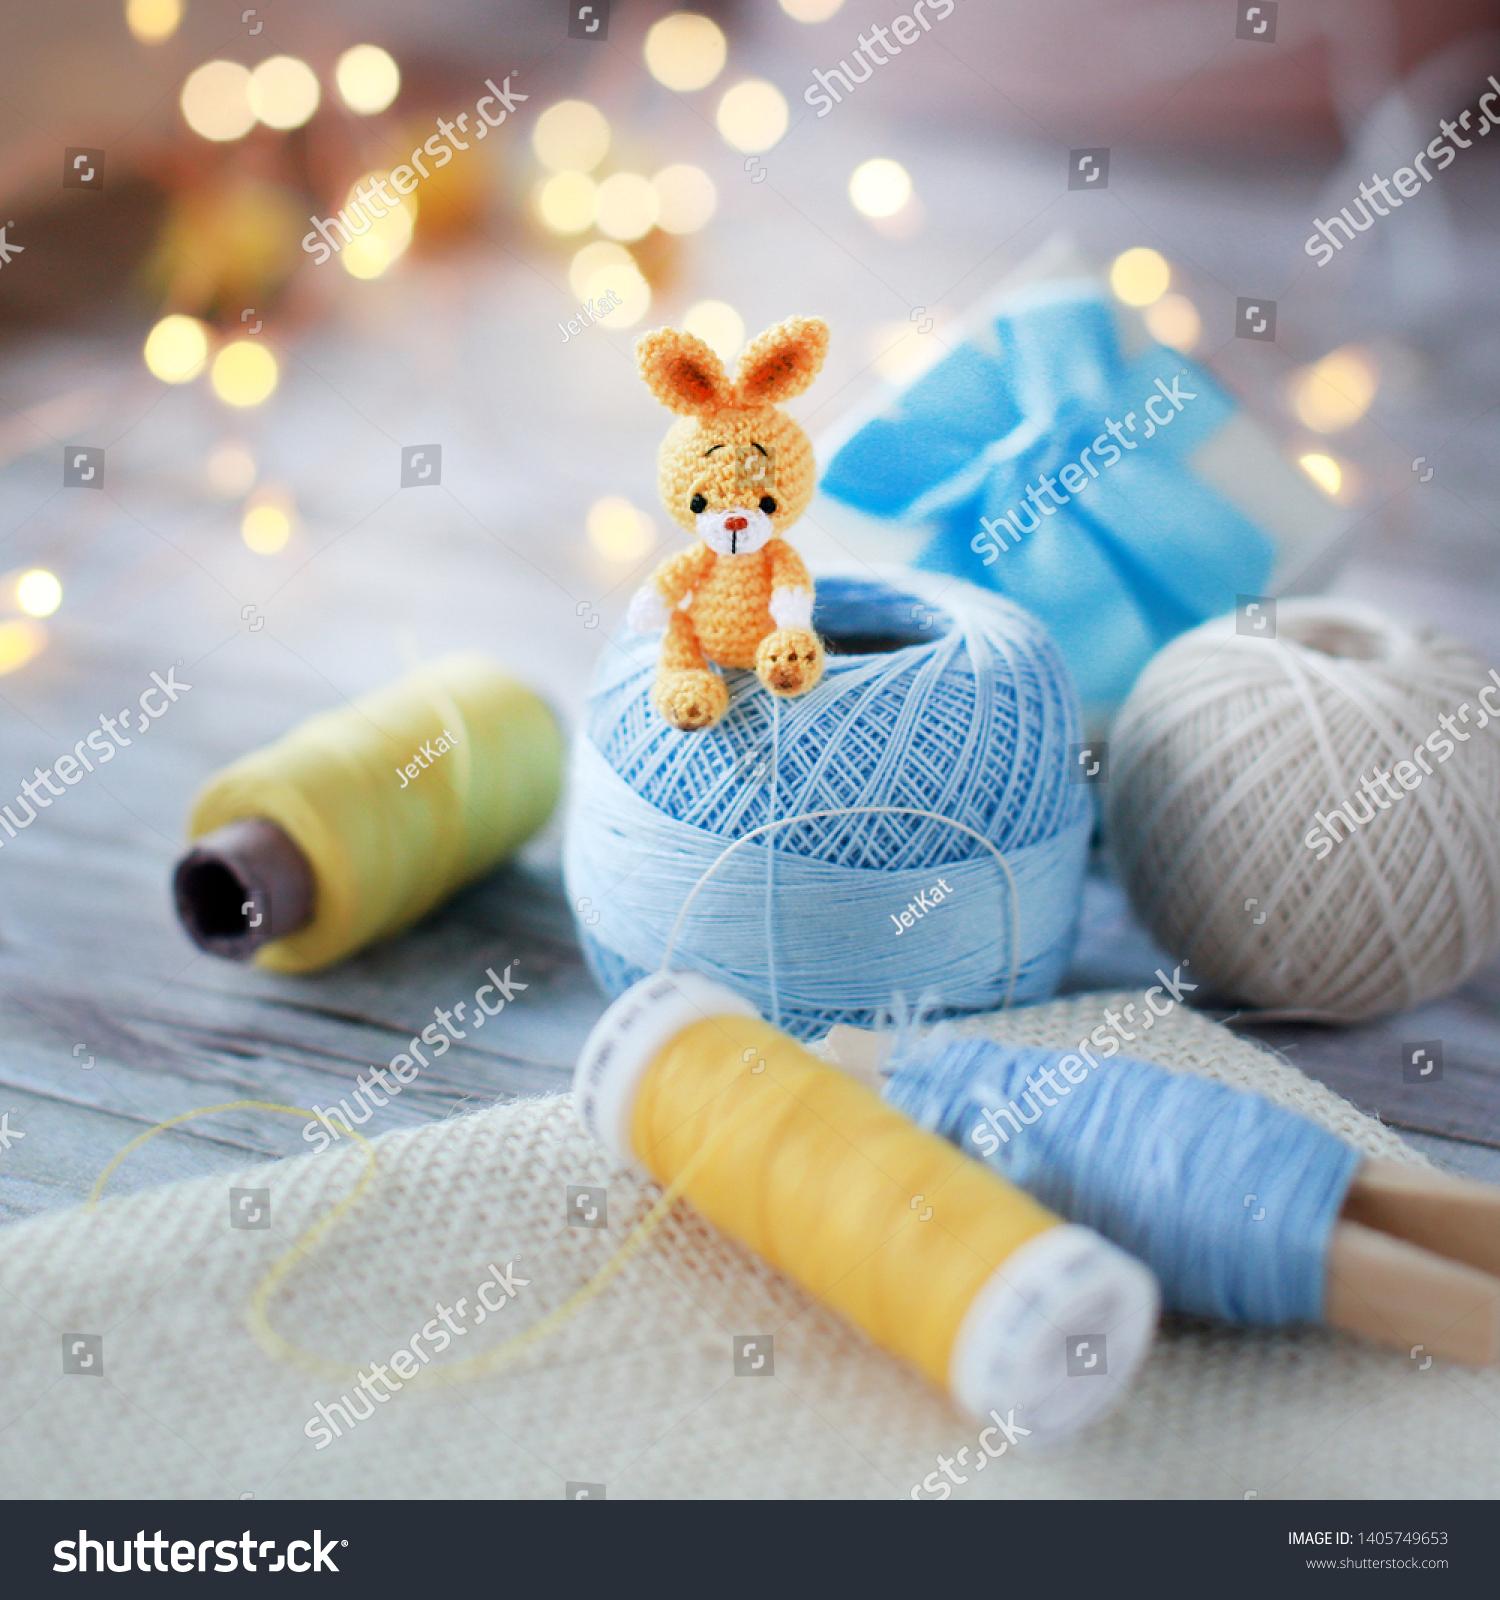 Baby Bunnies - three amigurumi bunny crochet patterns : PlanetJune ... | 1600x1500